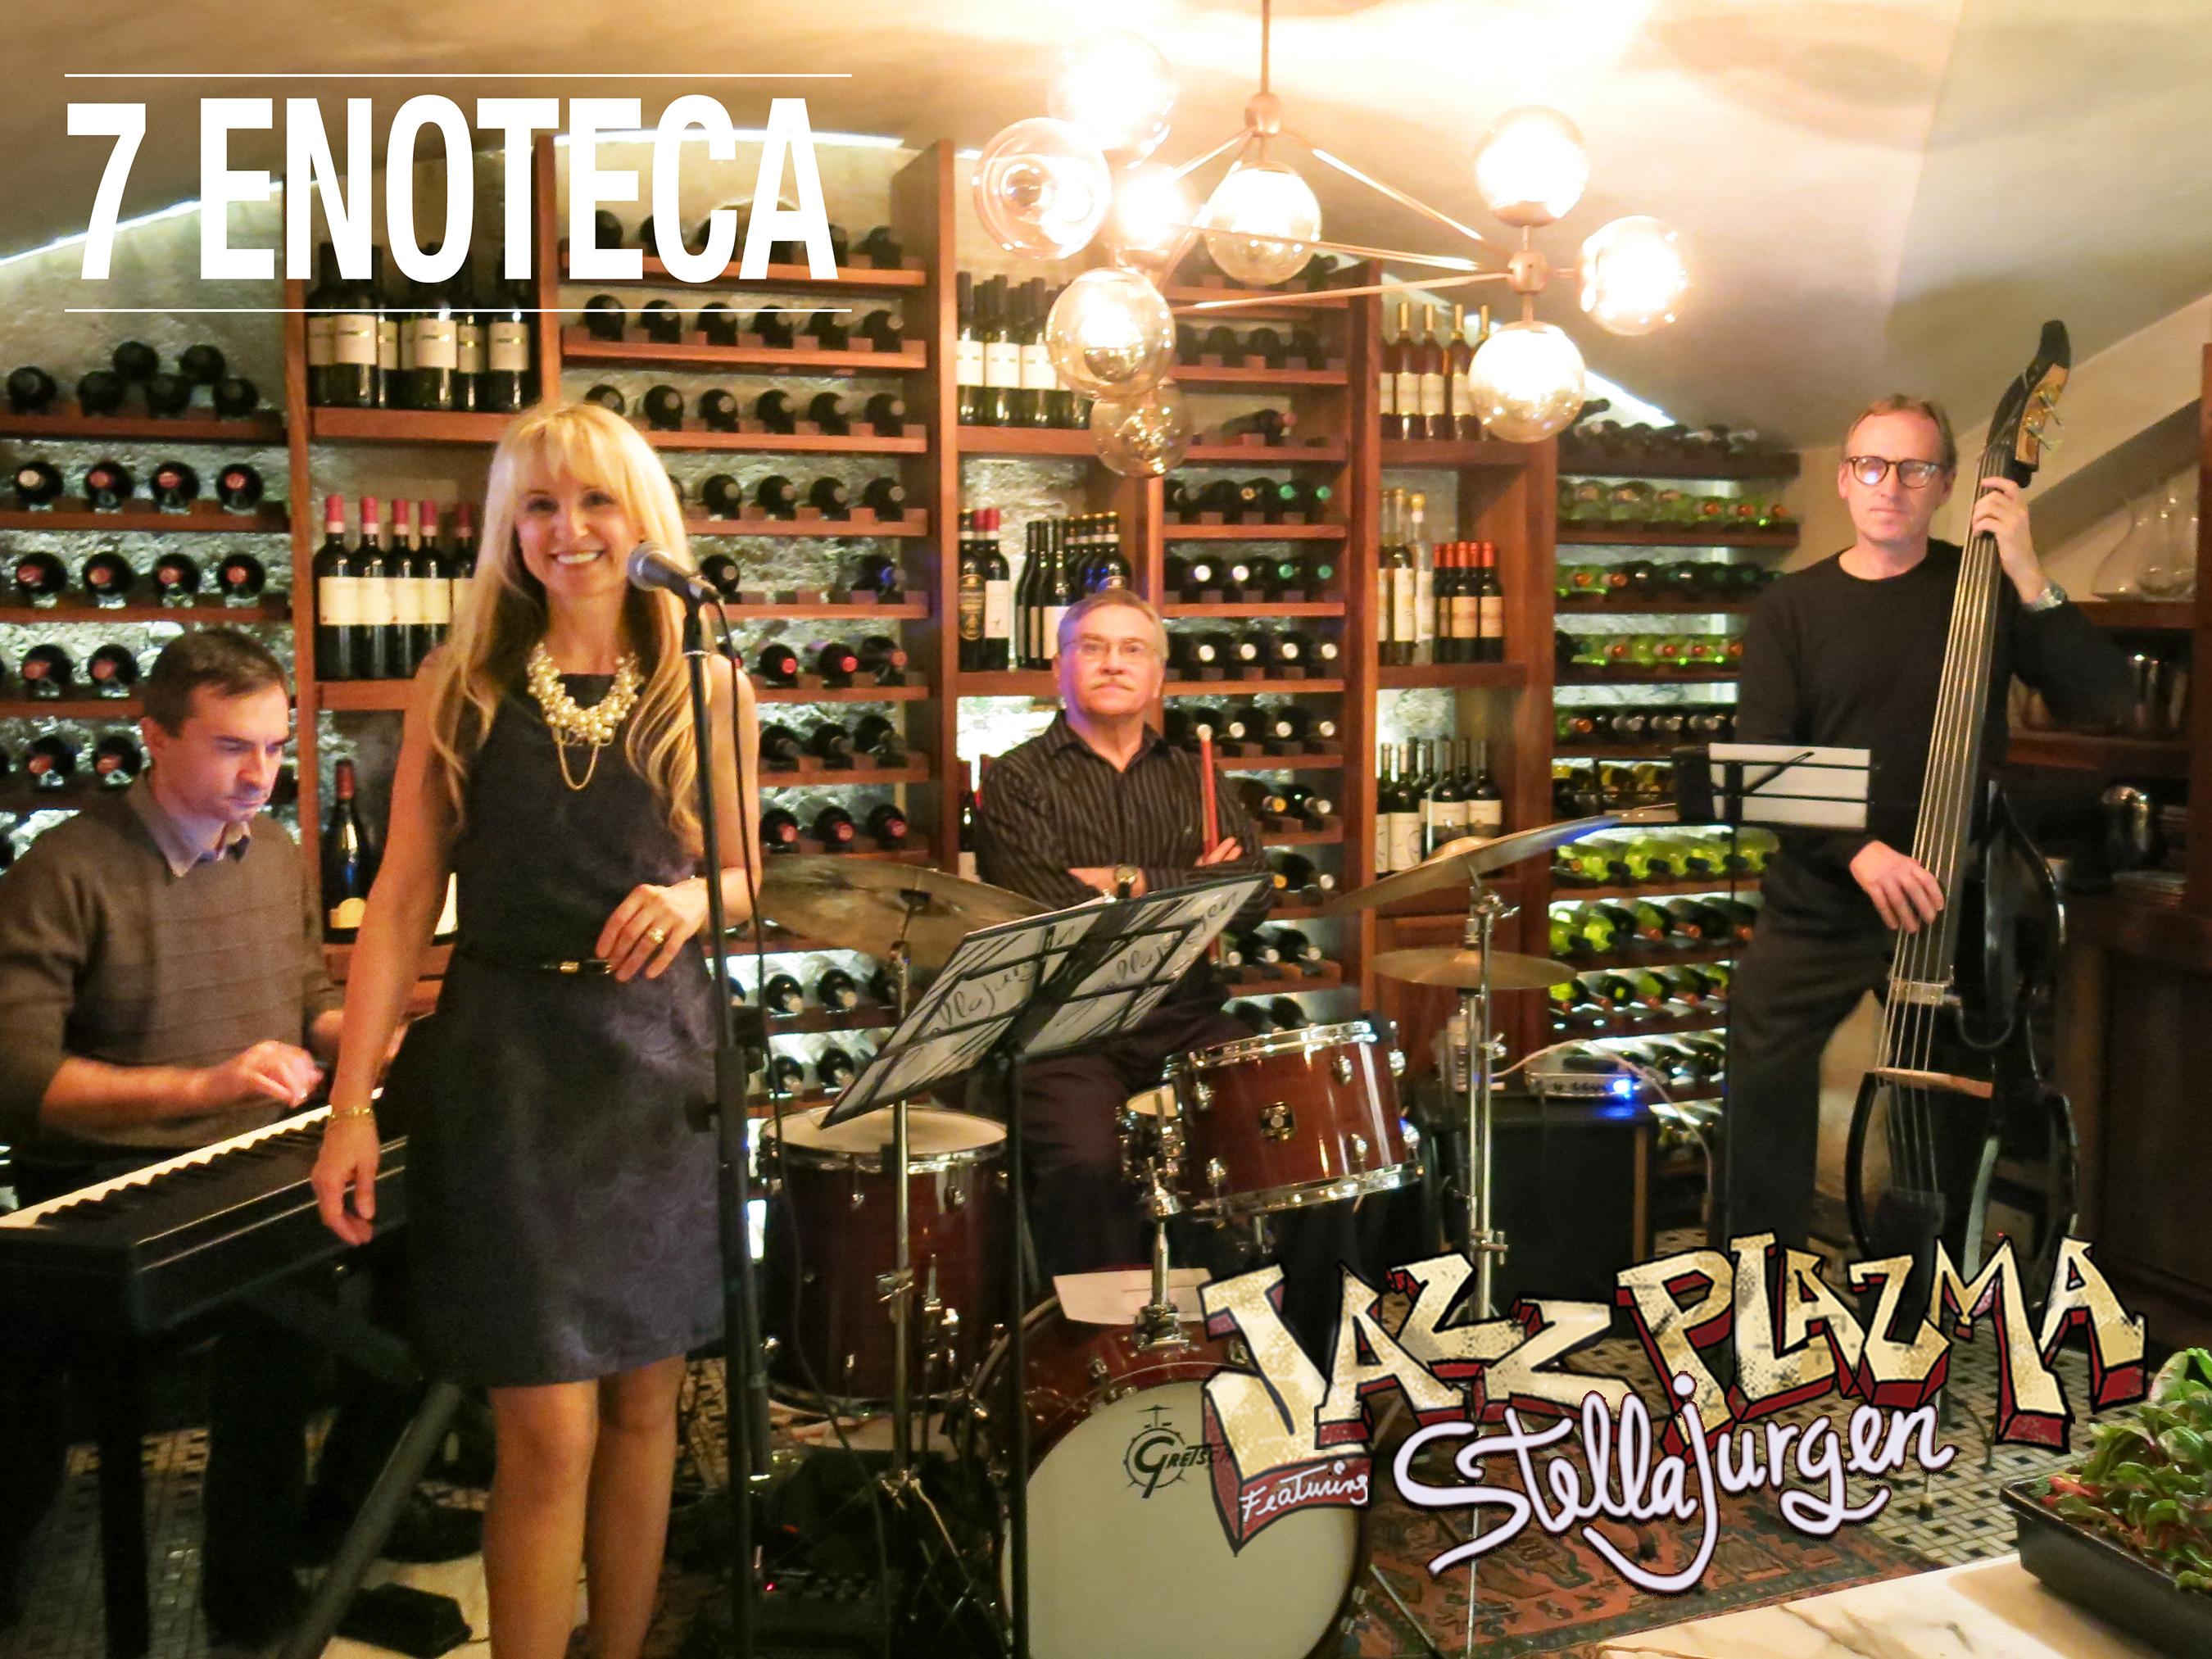 Jazz-Plazma-featuring-Stella-Jurgen-7Enoteca-Feb10-2015-web